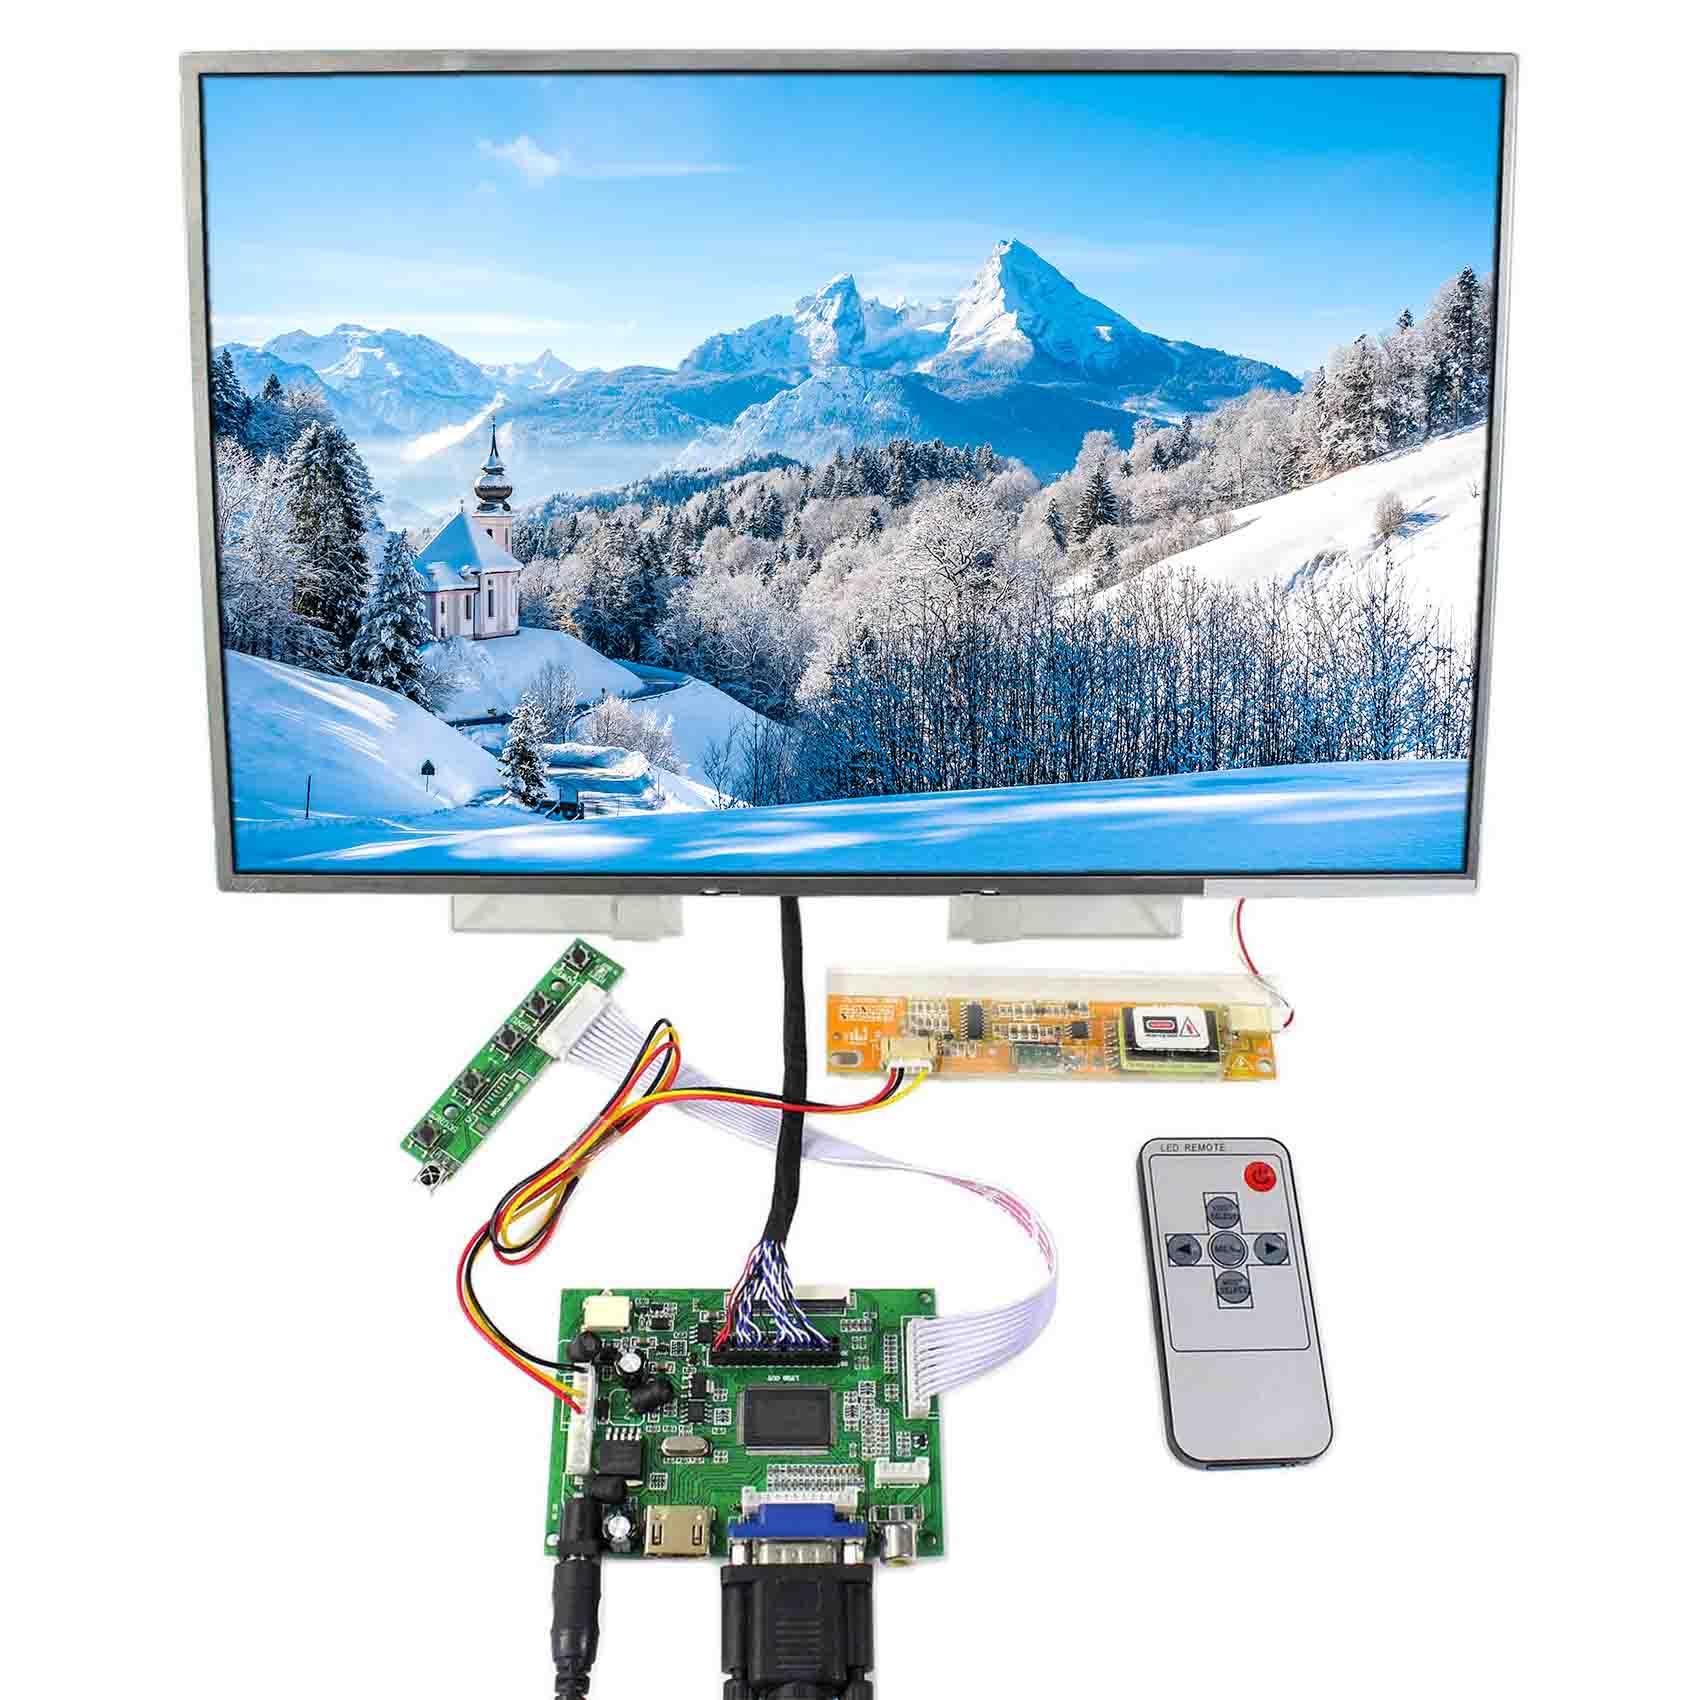 HDMI+VGA+2AV LCD Controller Board work with 15.4inch 1280x800 lcd(One of B154EW02 LTN154X3-L01 LP154WX4 LP154W01 N154I2)HDMI+VGA+2AV LCD Controller Board work with 15.4inch 1280x800 lcd(One of B154EW02 LTN154X3-L01 LP154WX4 LP154W01 N154I2)